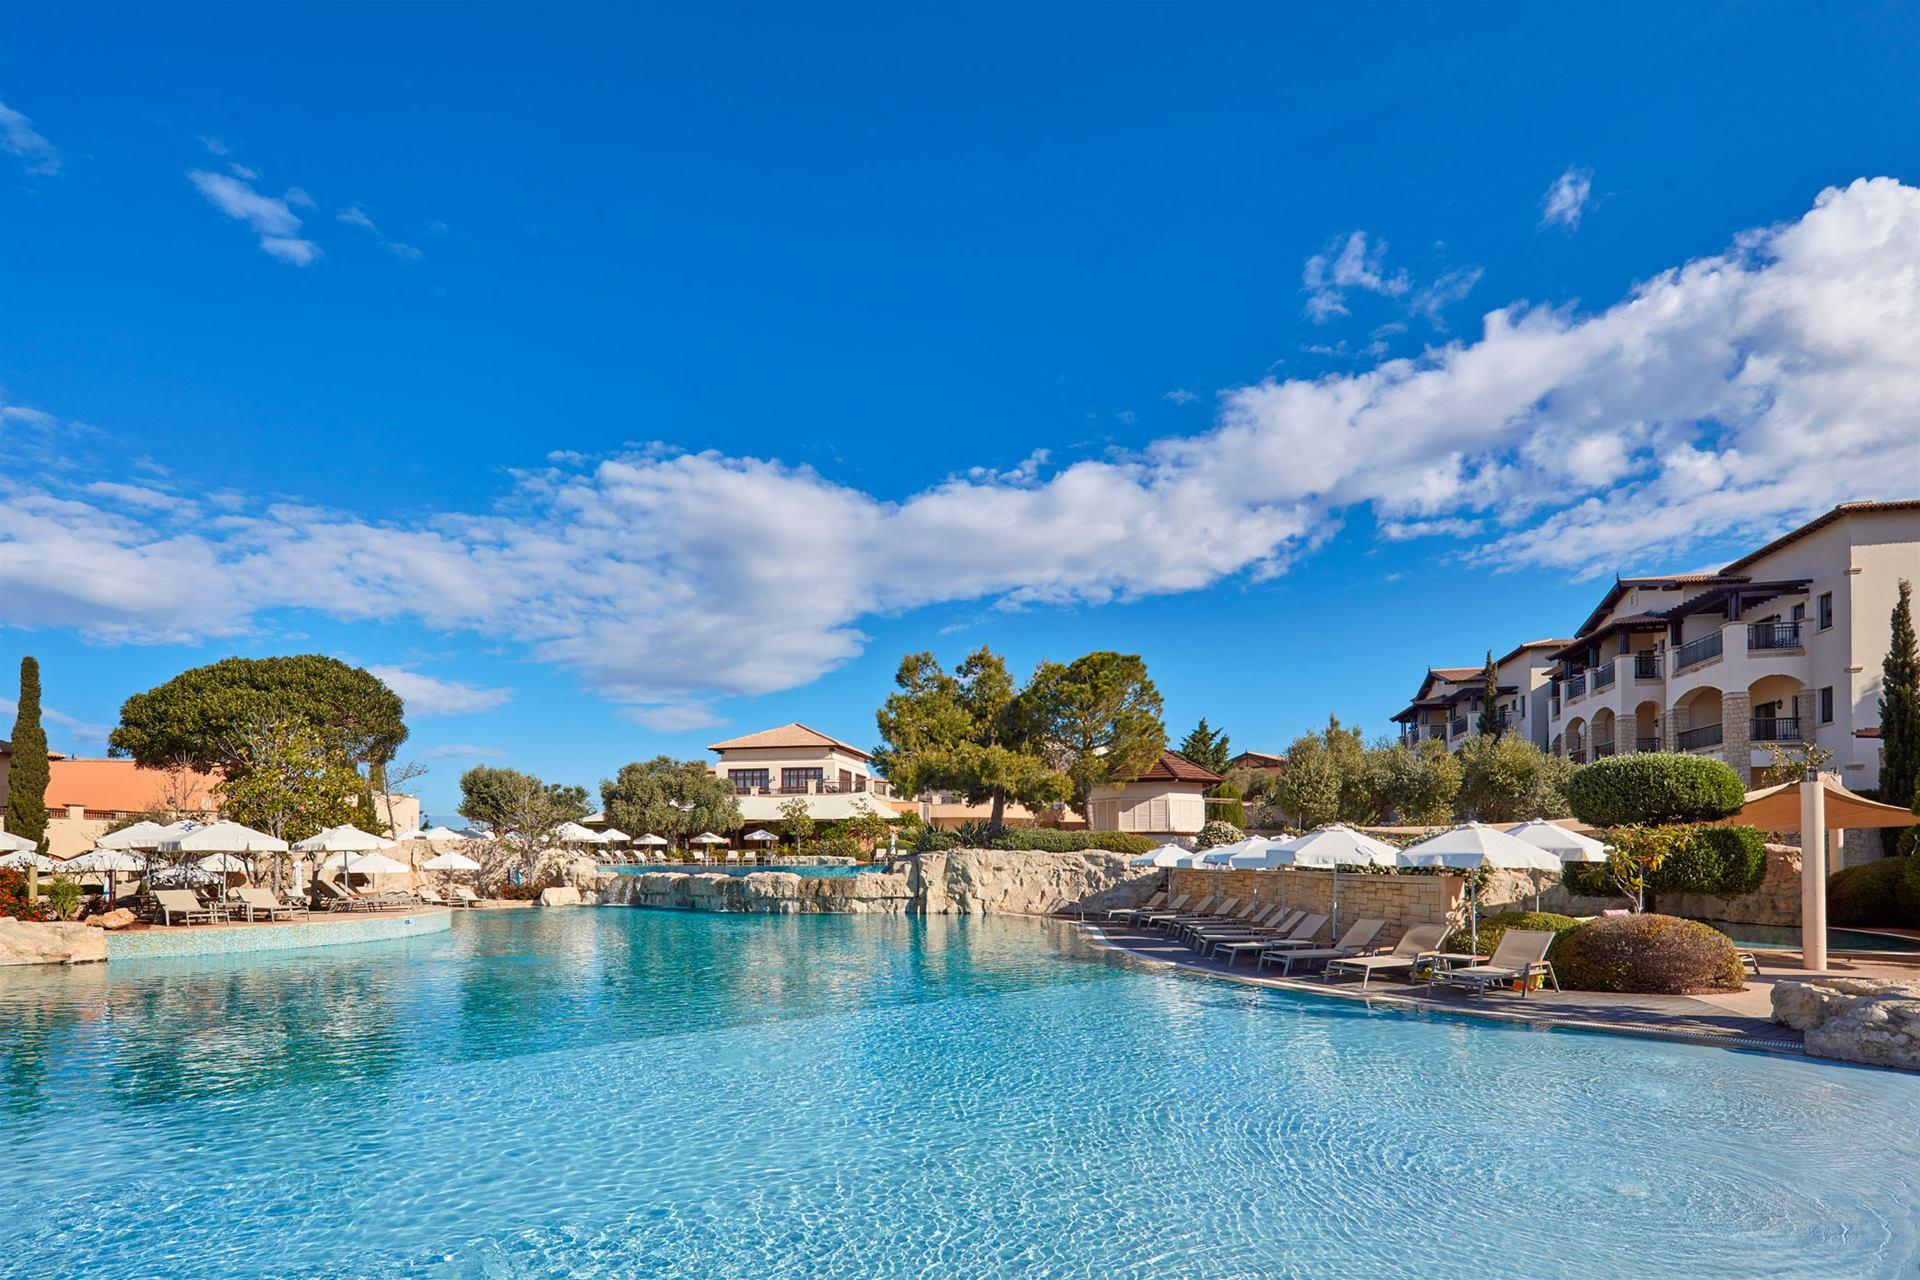 Aphrodite hills hotel atlantica hotels for Garden hills pool hours